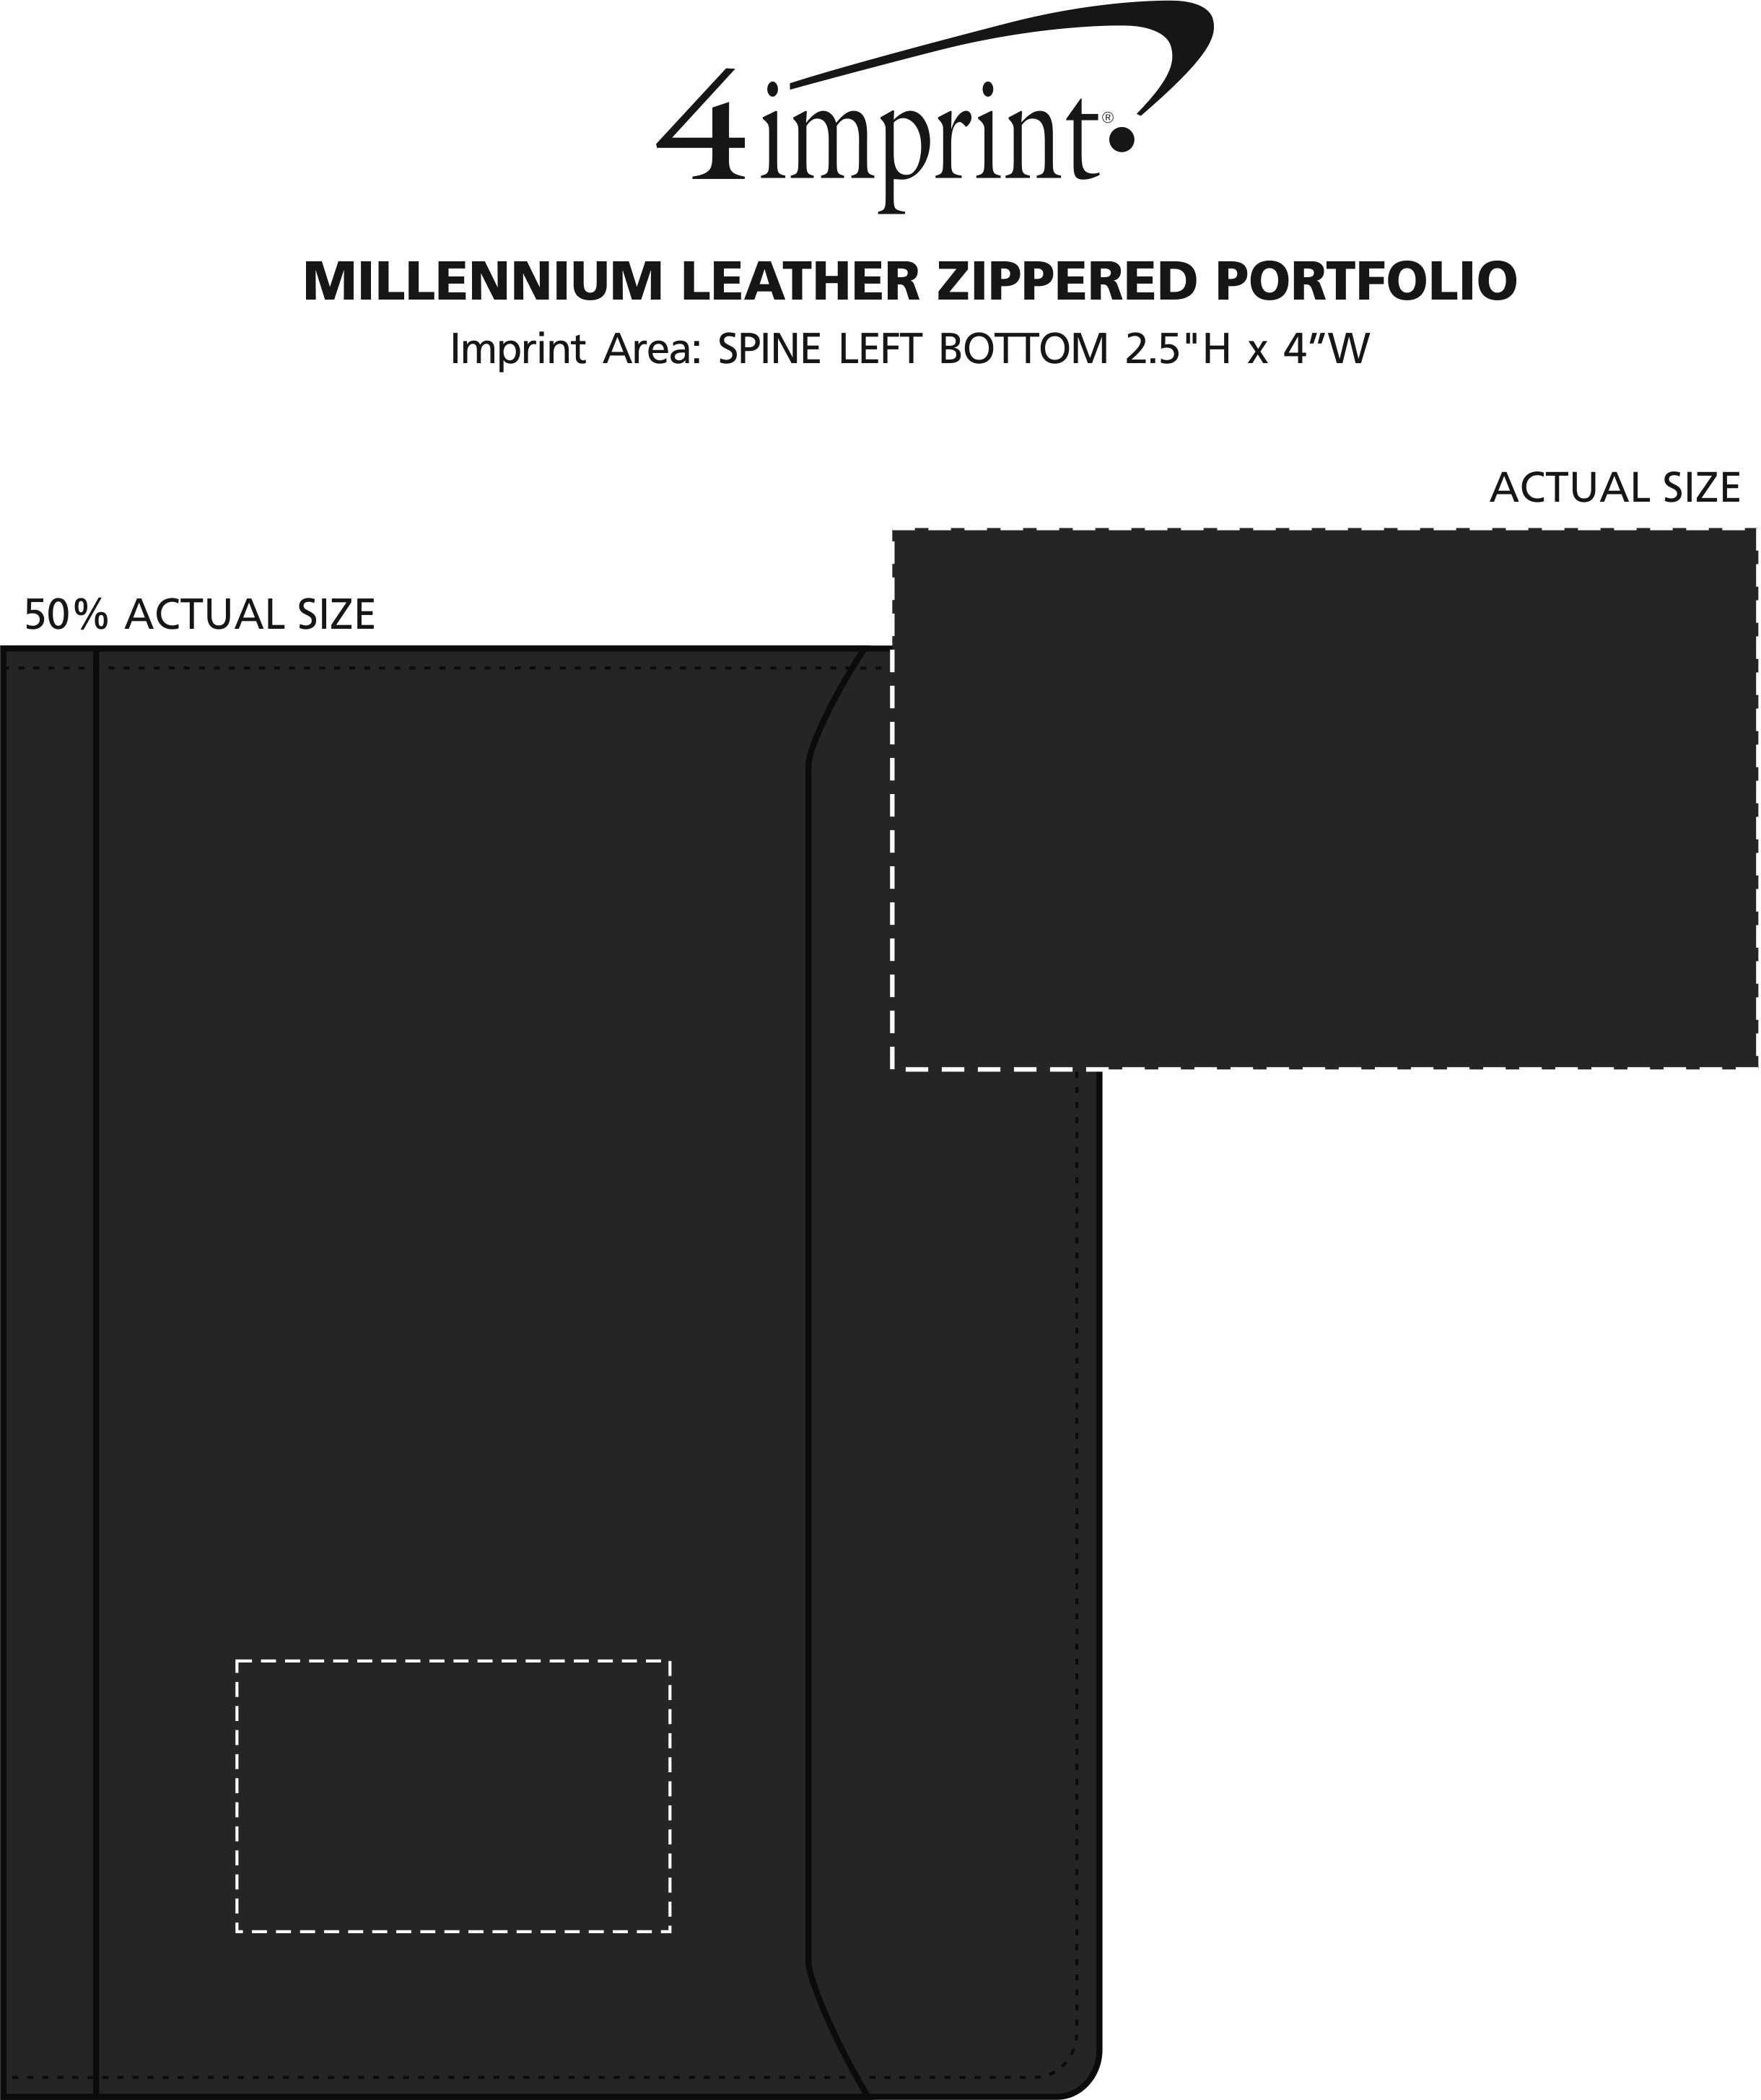 Imprint Area of Millennium Leather Zippered Portfolio